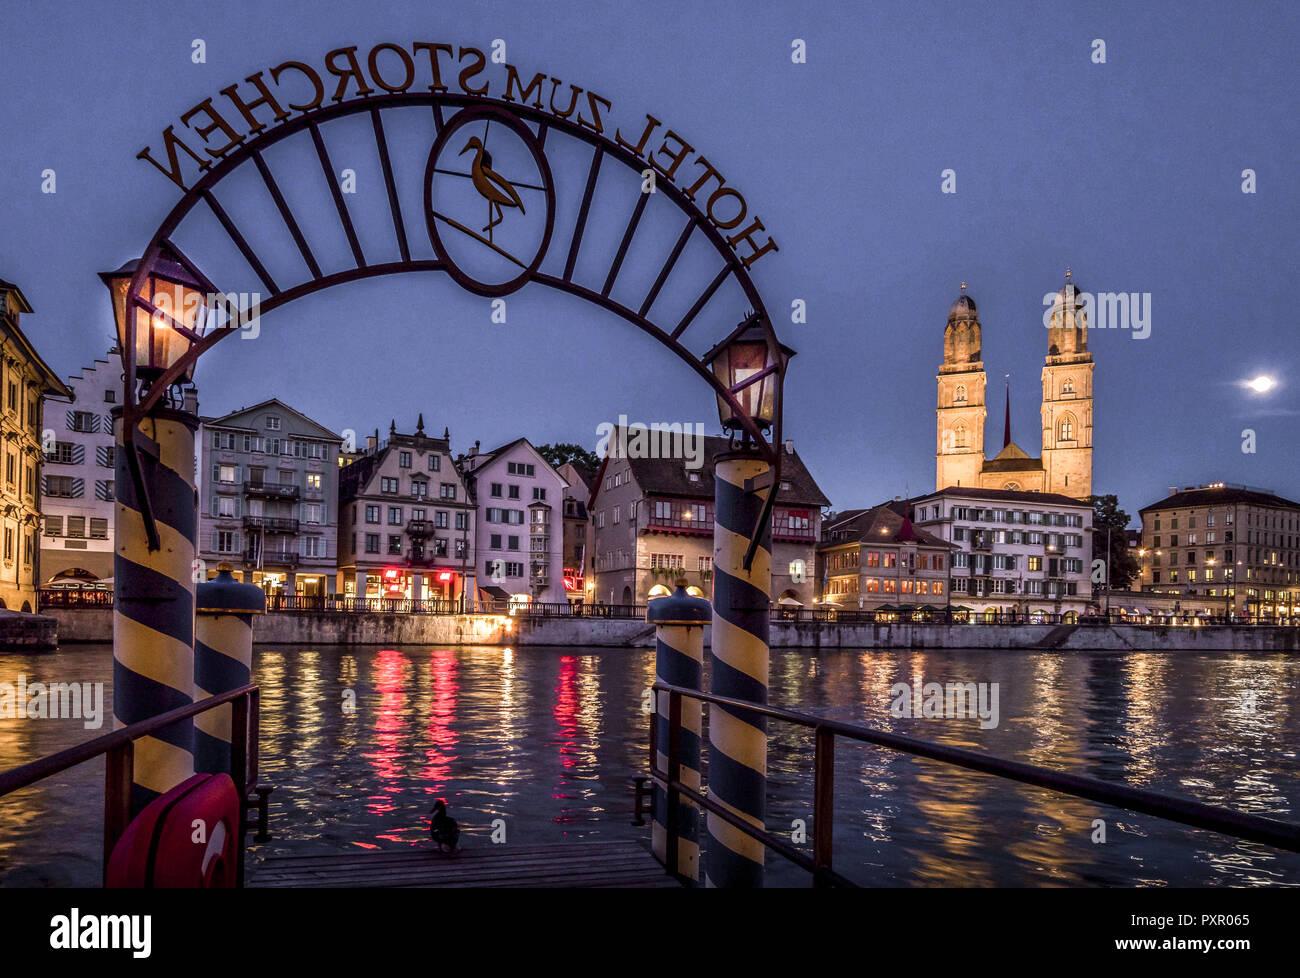 Limmatquai and Grossmunster in Zurich at Night, Switzerland - Stock Image